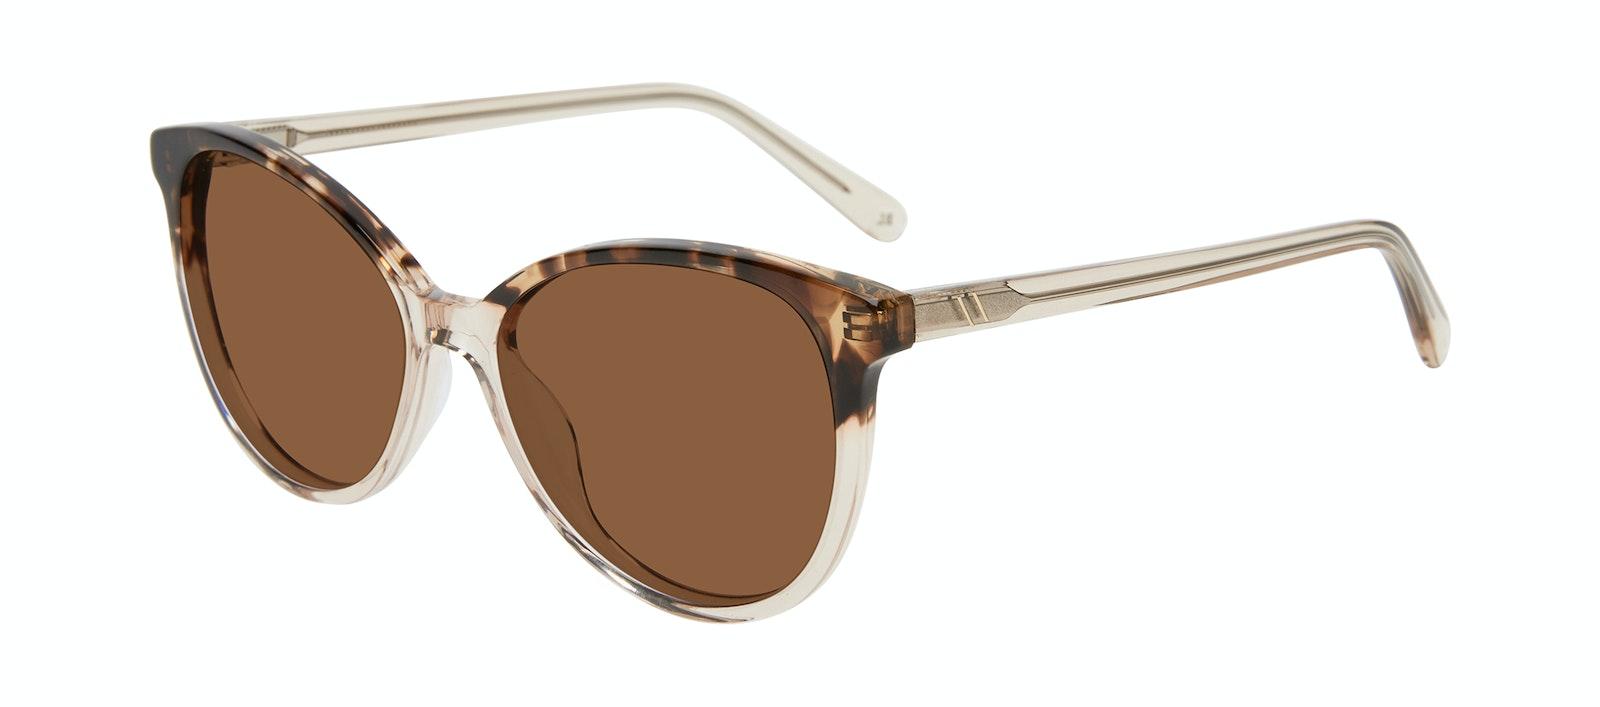 Affordable Fashion Glasses Cat Eye Sunglasses Women Esprit L Golden Tortoise Tilt